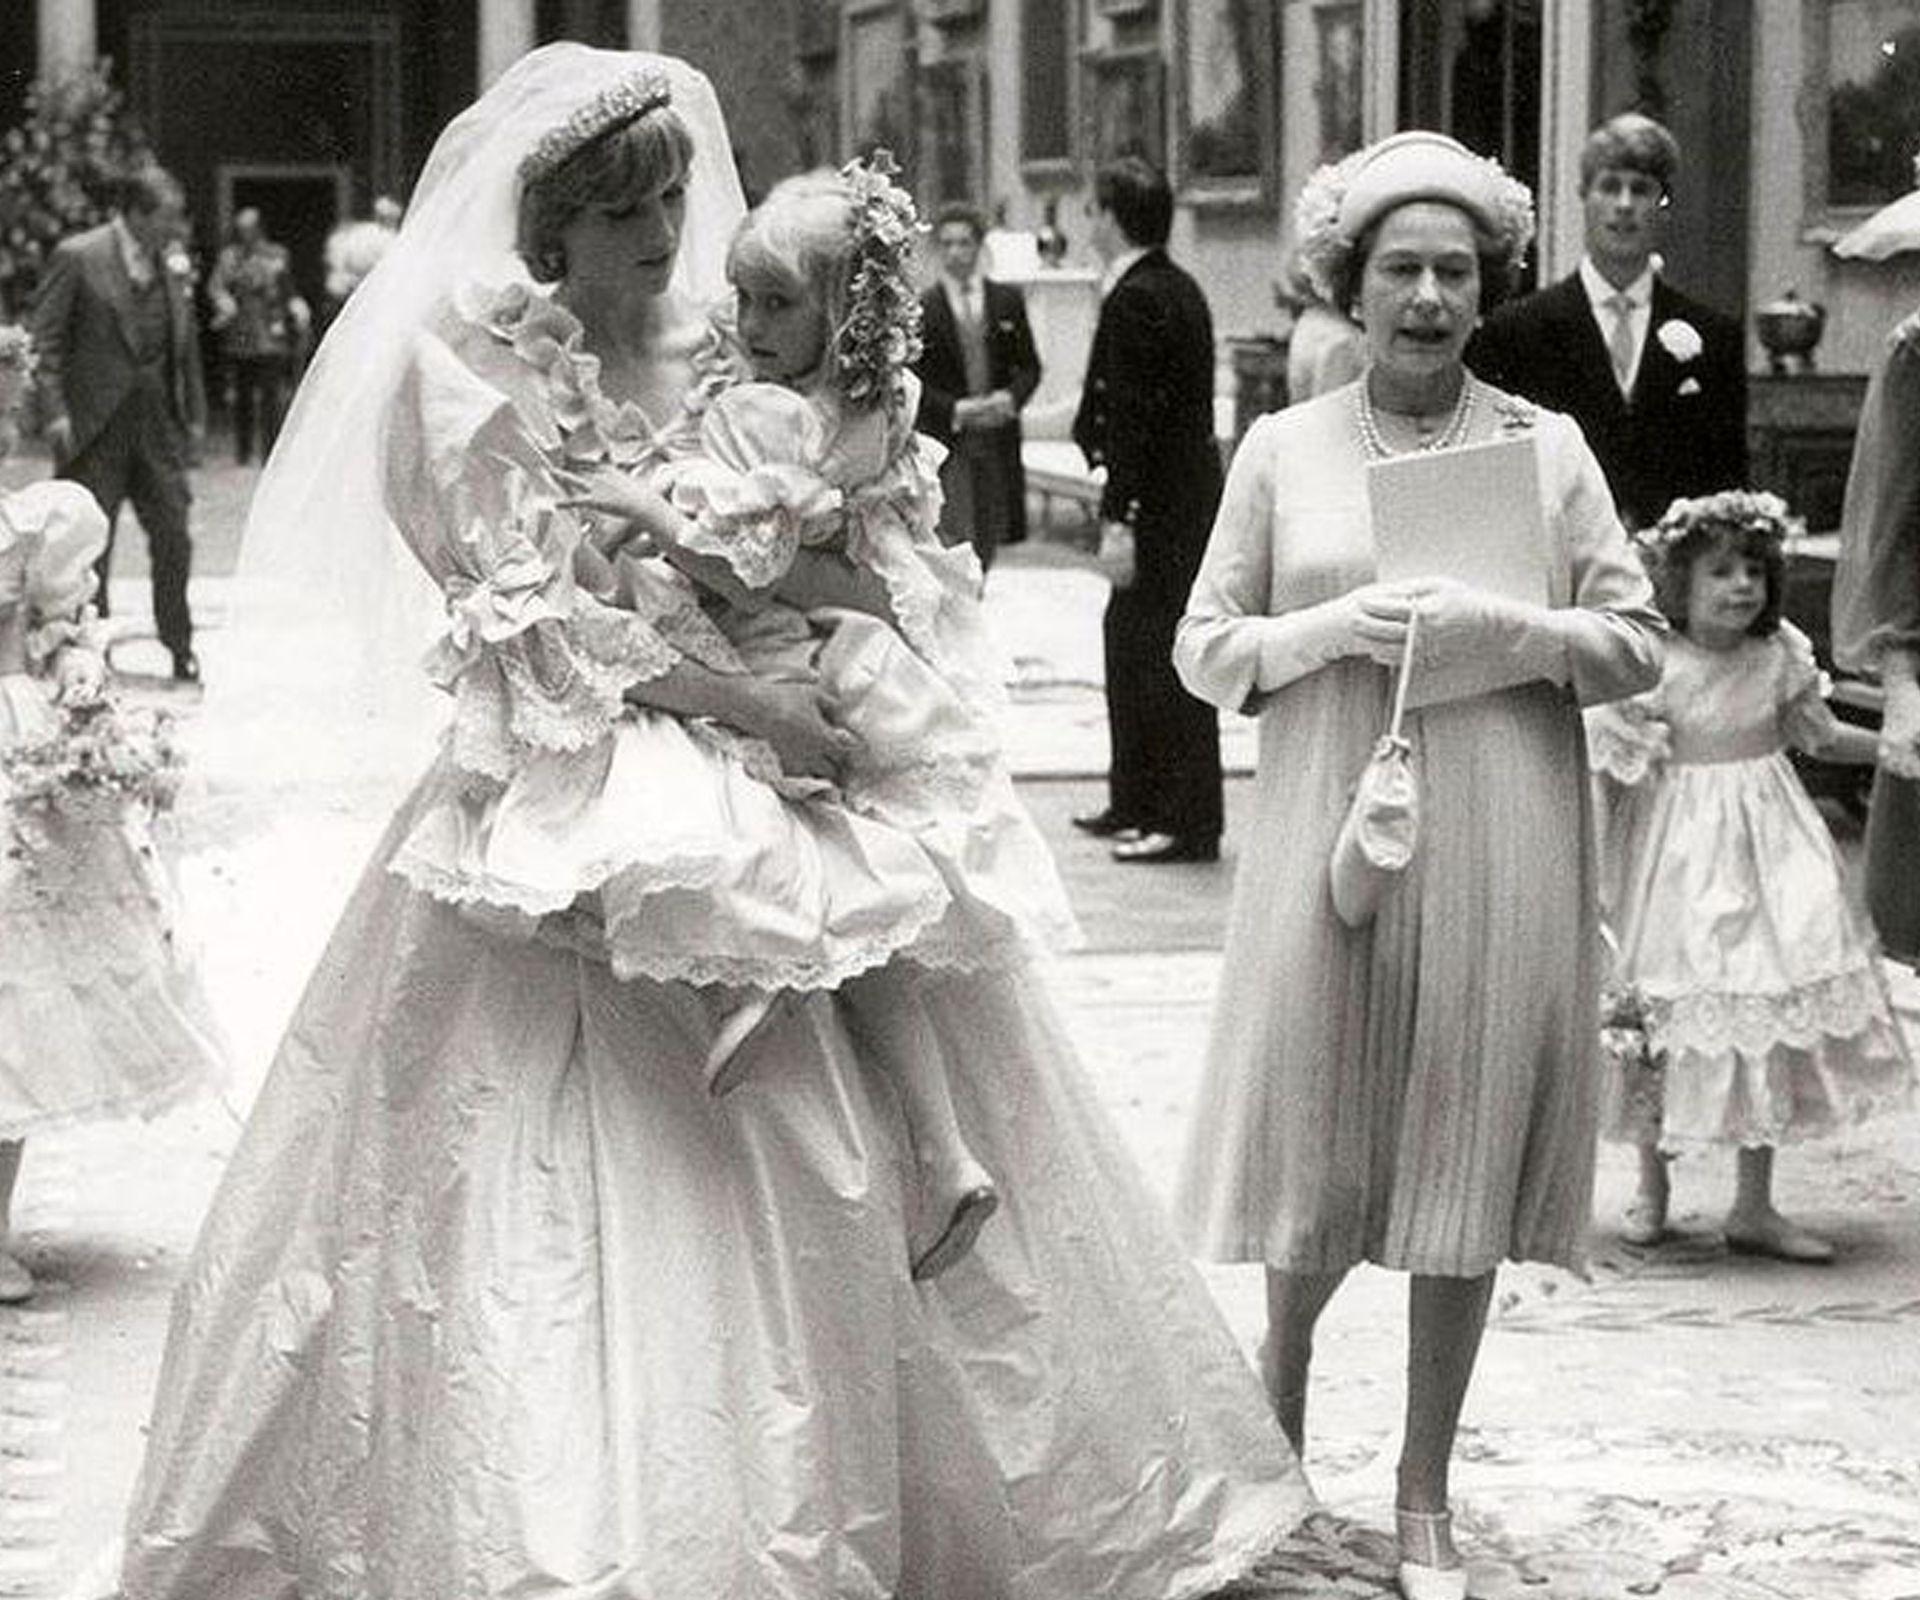 Princess Diana at the wedding reception held at Buckingham